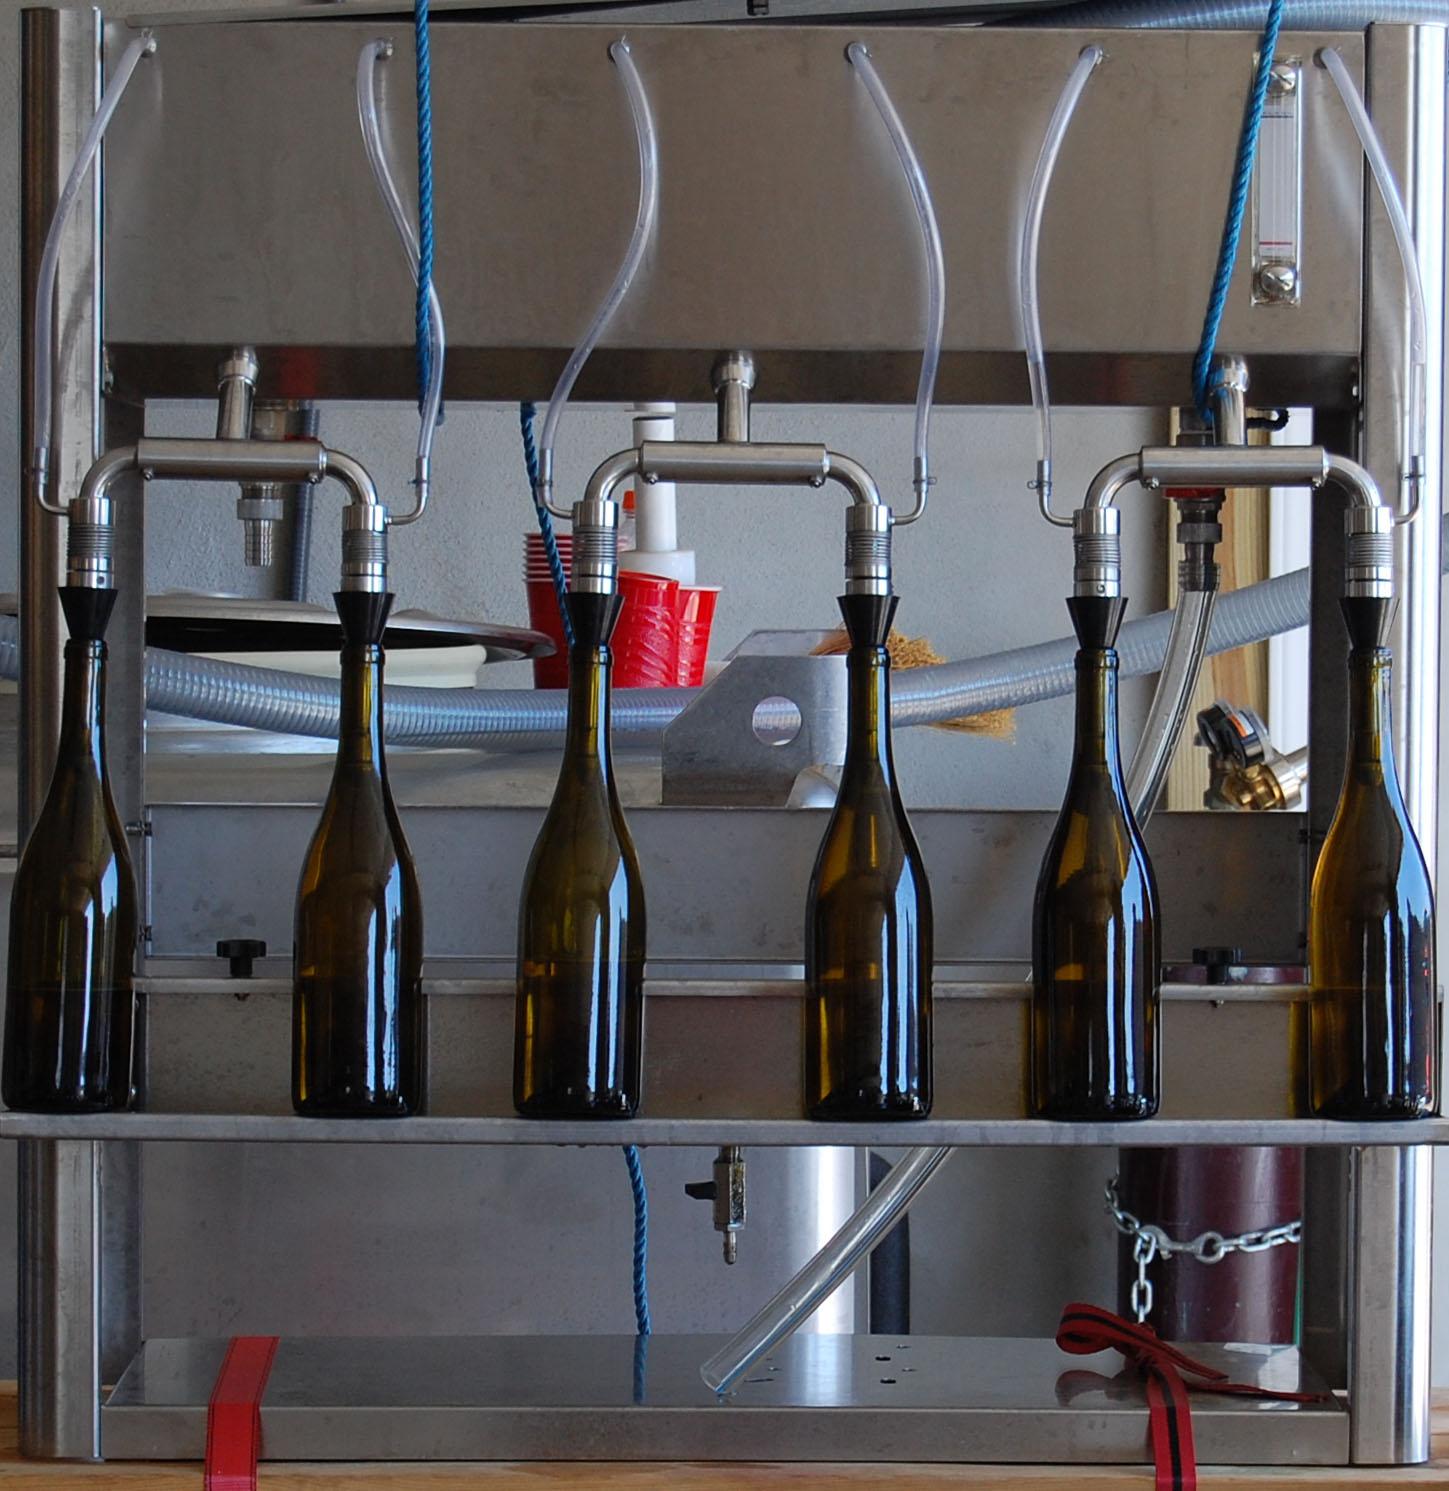 Six-spout bottler filling Orion